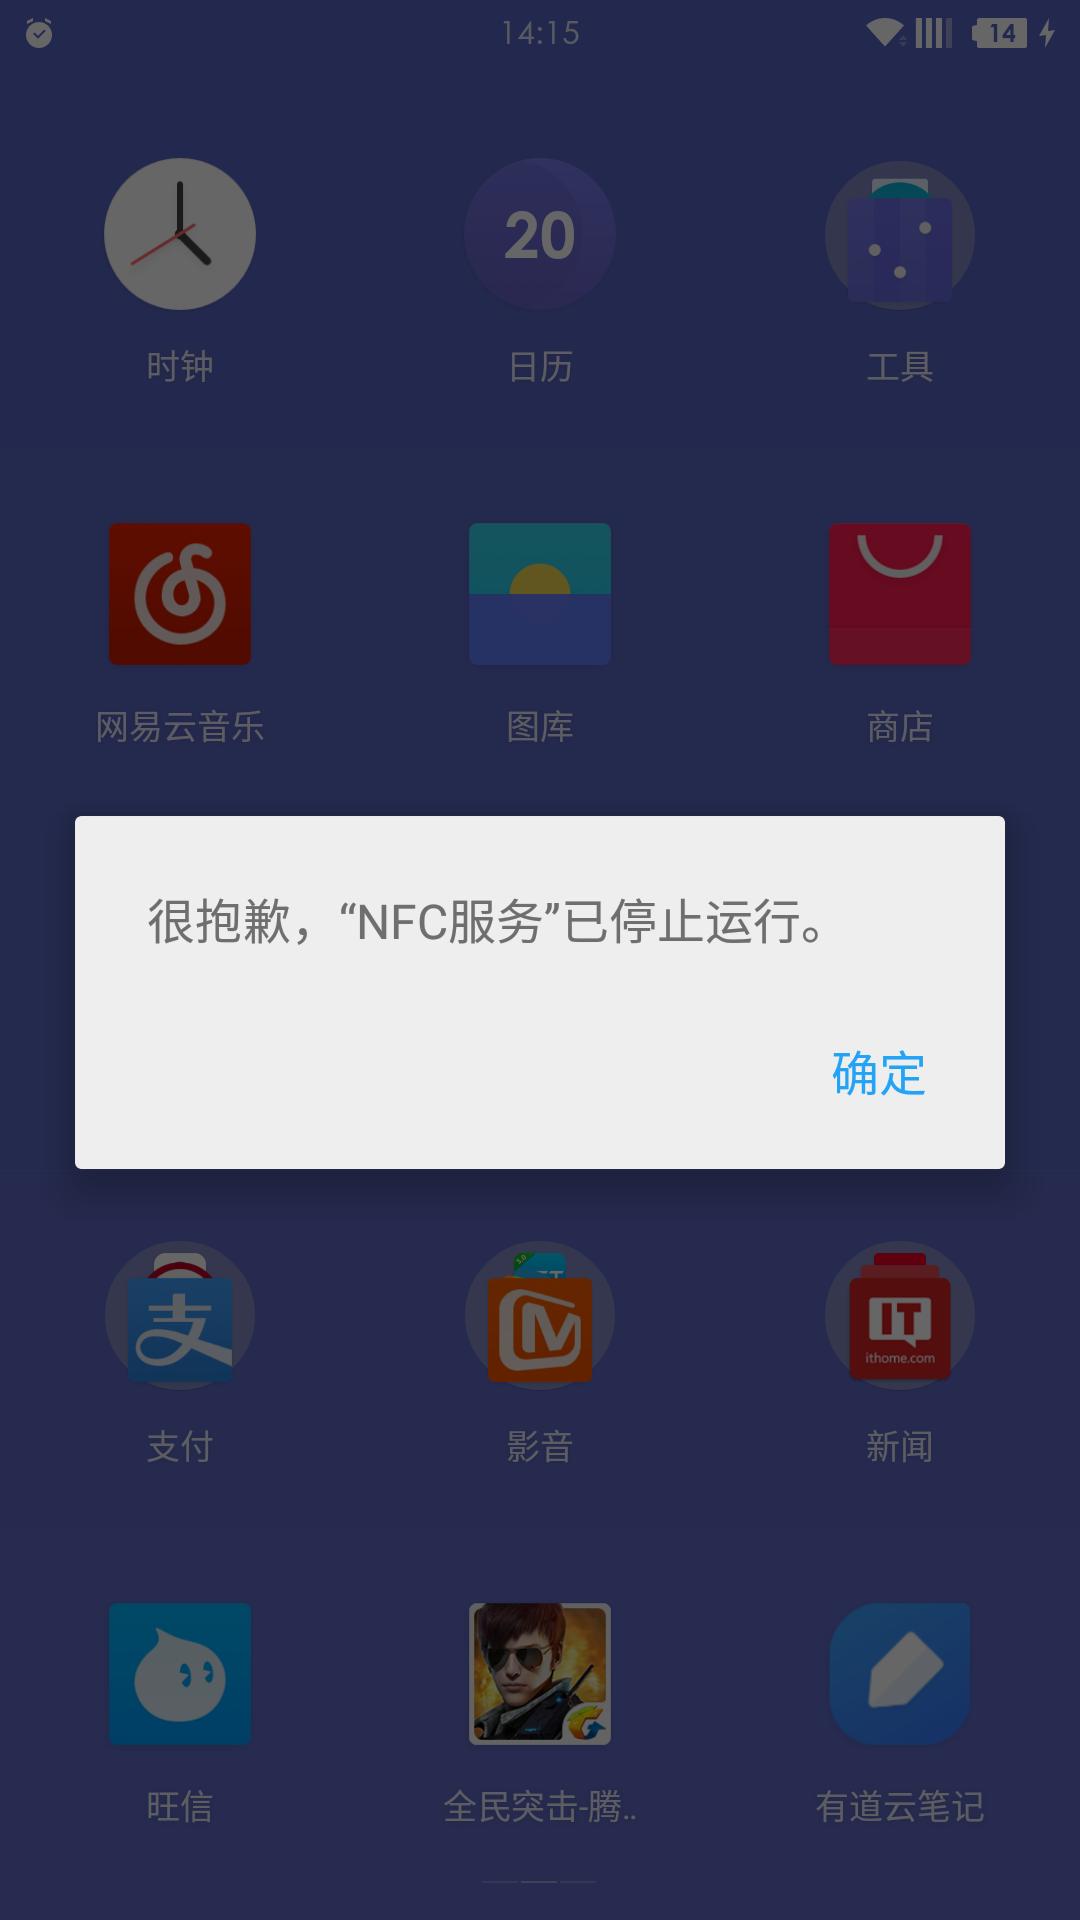 Screenshot_2015-11-20-14-15-33.png